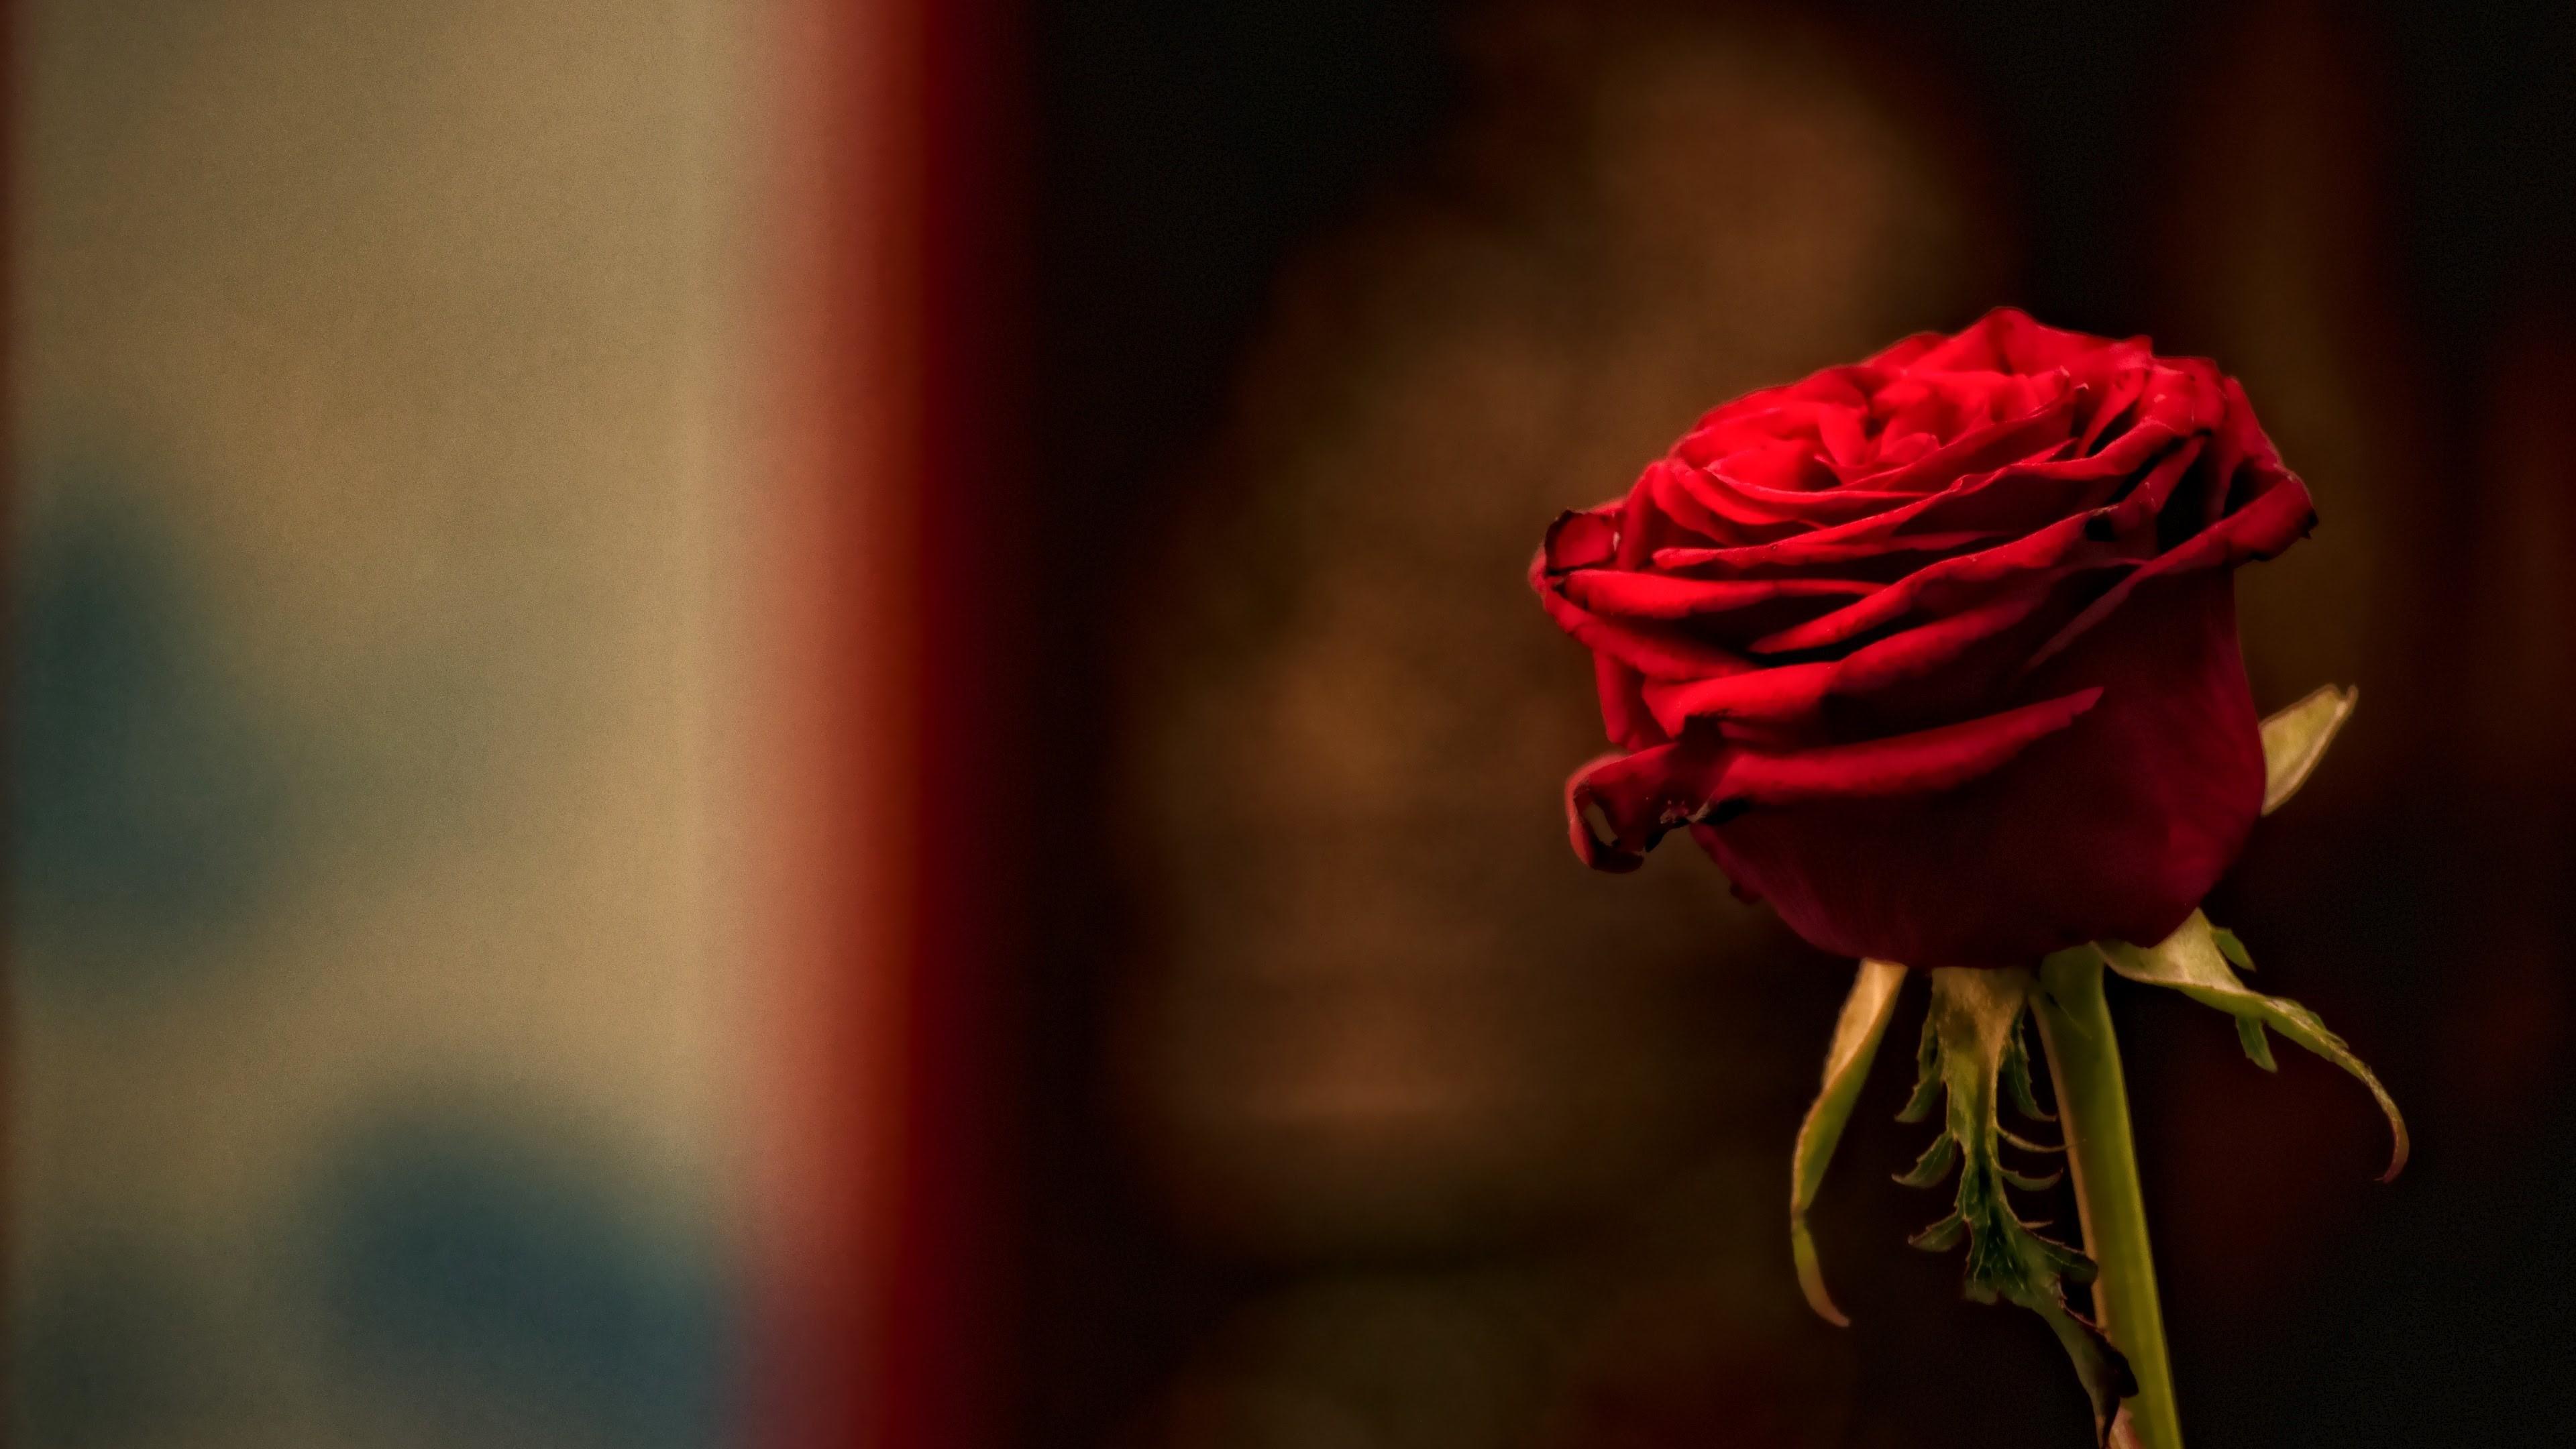 Single Rose Wallpapers: Red Roses Wallpapers For Desktop ·① WallpaperTag